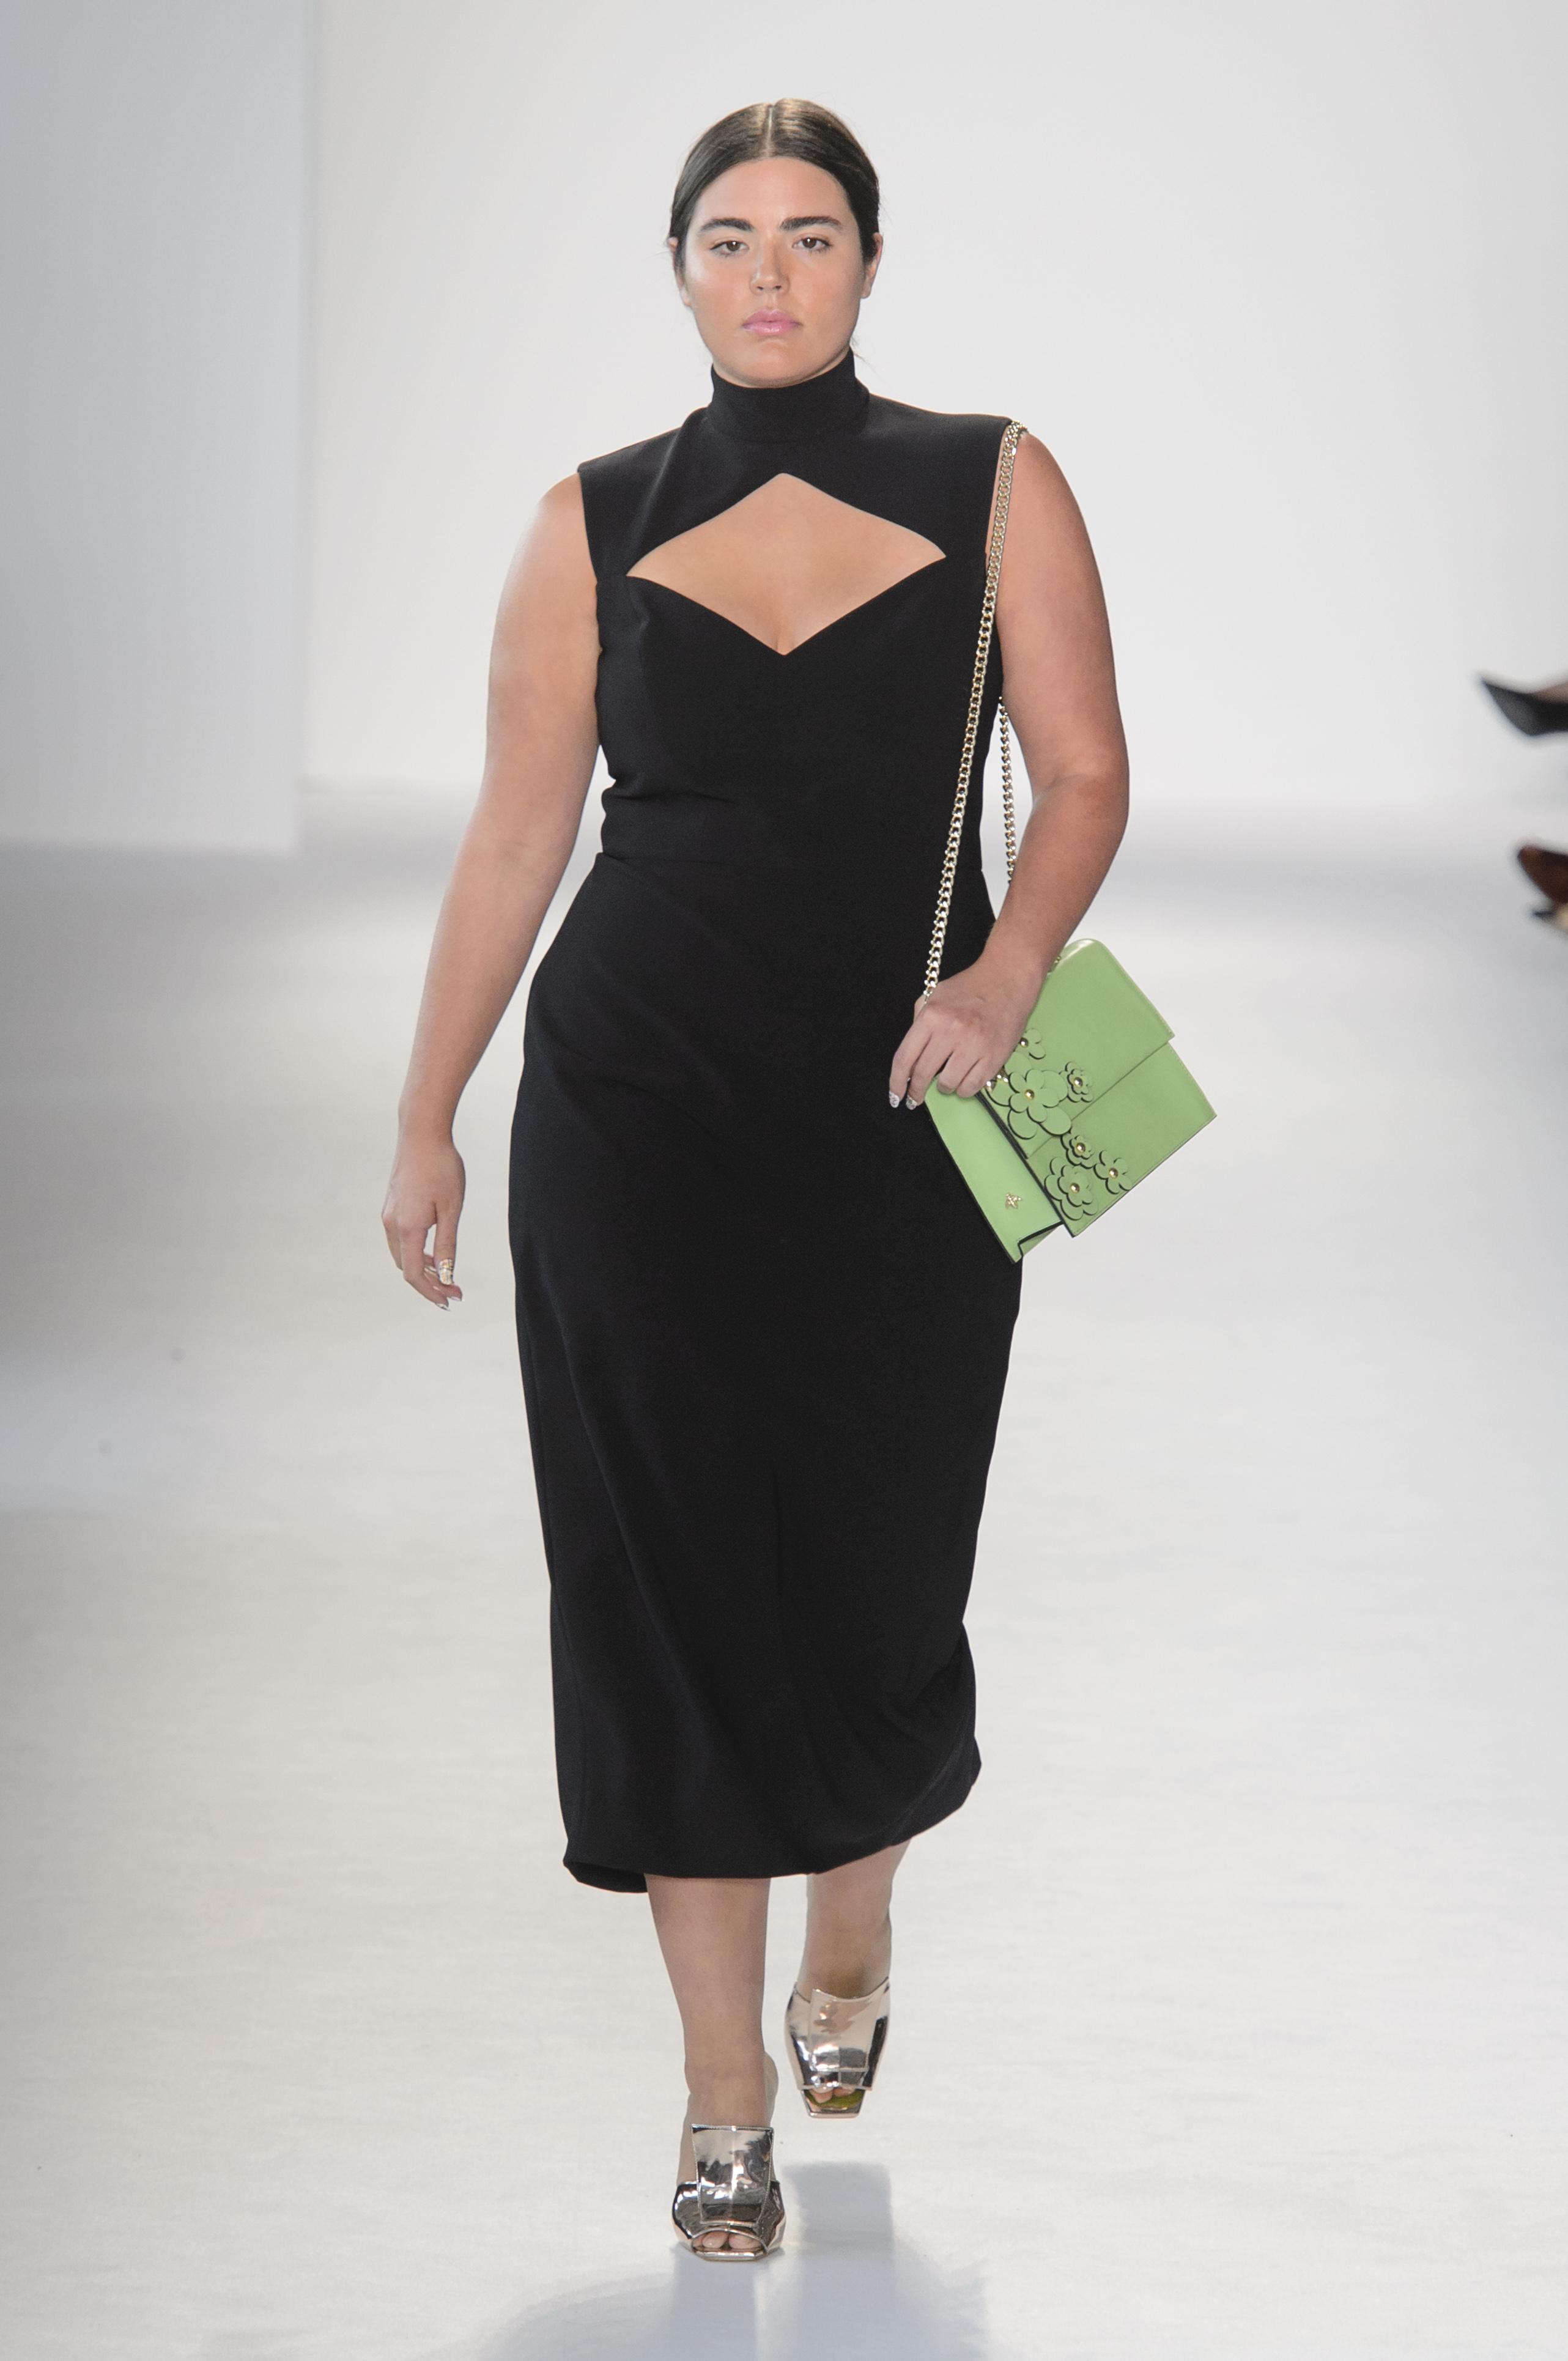 La modelo plus Alessandra Garcia en Christian Siriano. (WGSN)